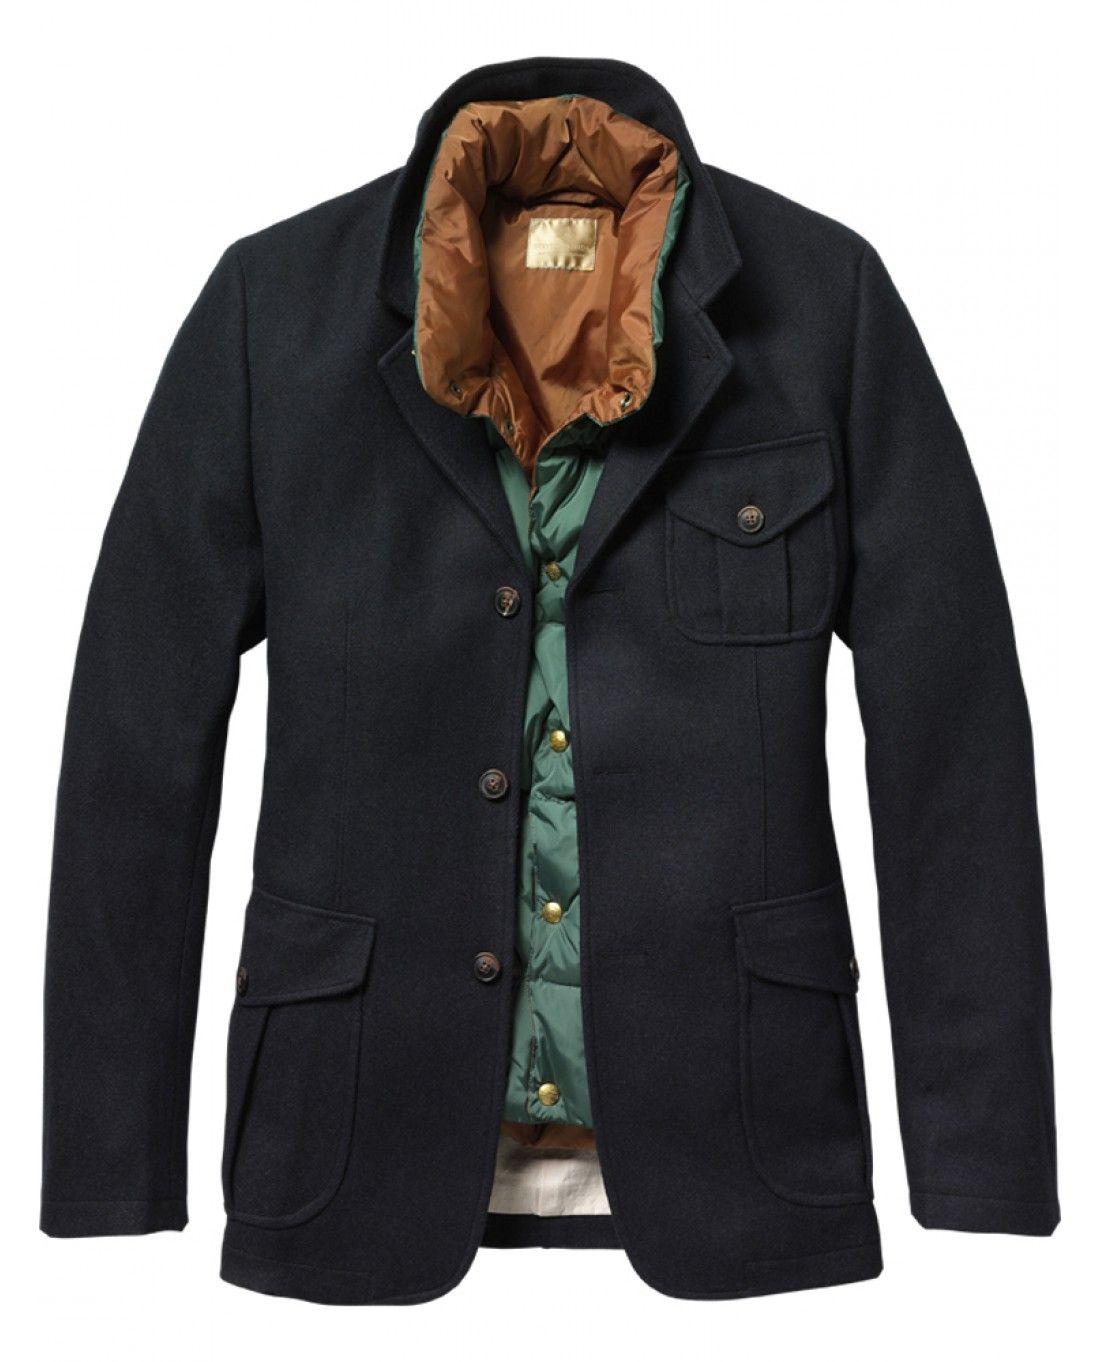 Hunting blazer and inner body warmer - Inbetweens - Scotch & Soda Online Shop